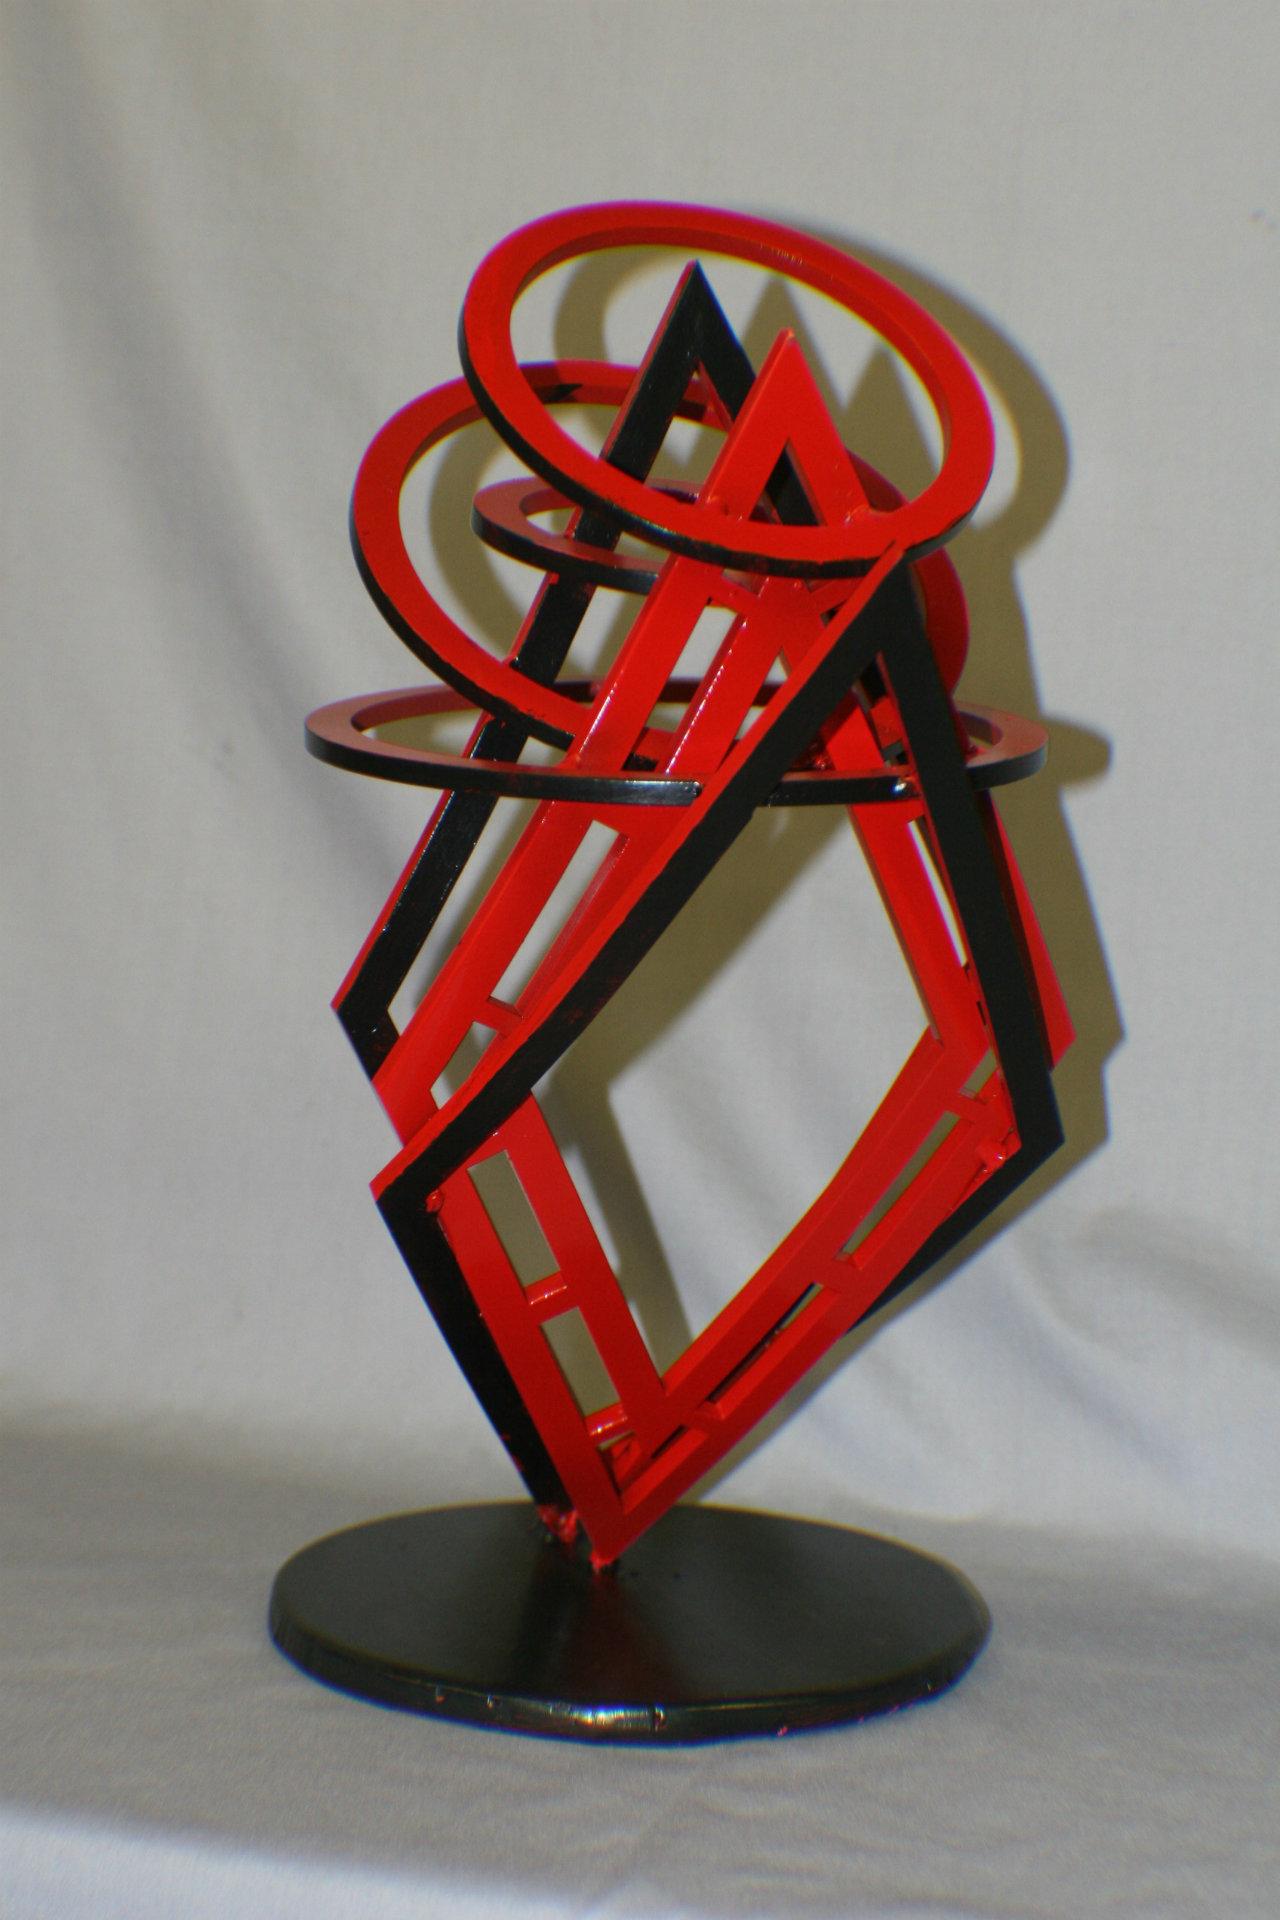 Virtuosity (model)